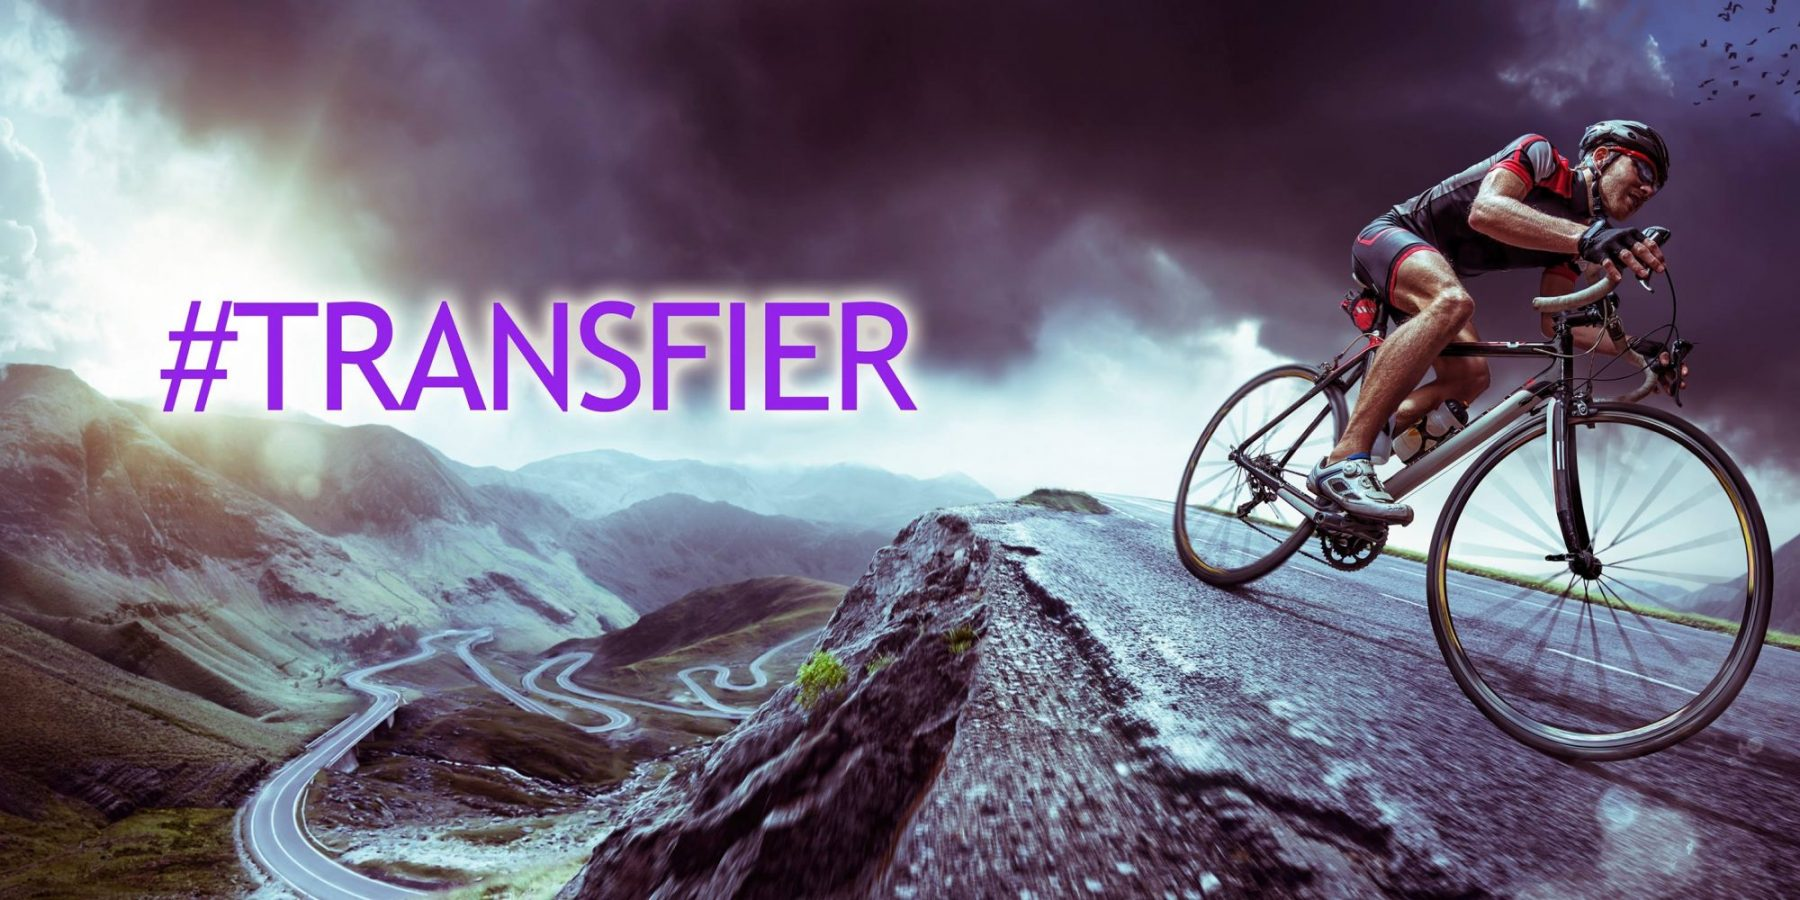 Затварят Трансфагарашан в събота заради триатлона TRANSFIER